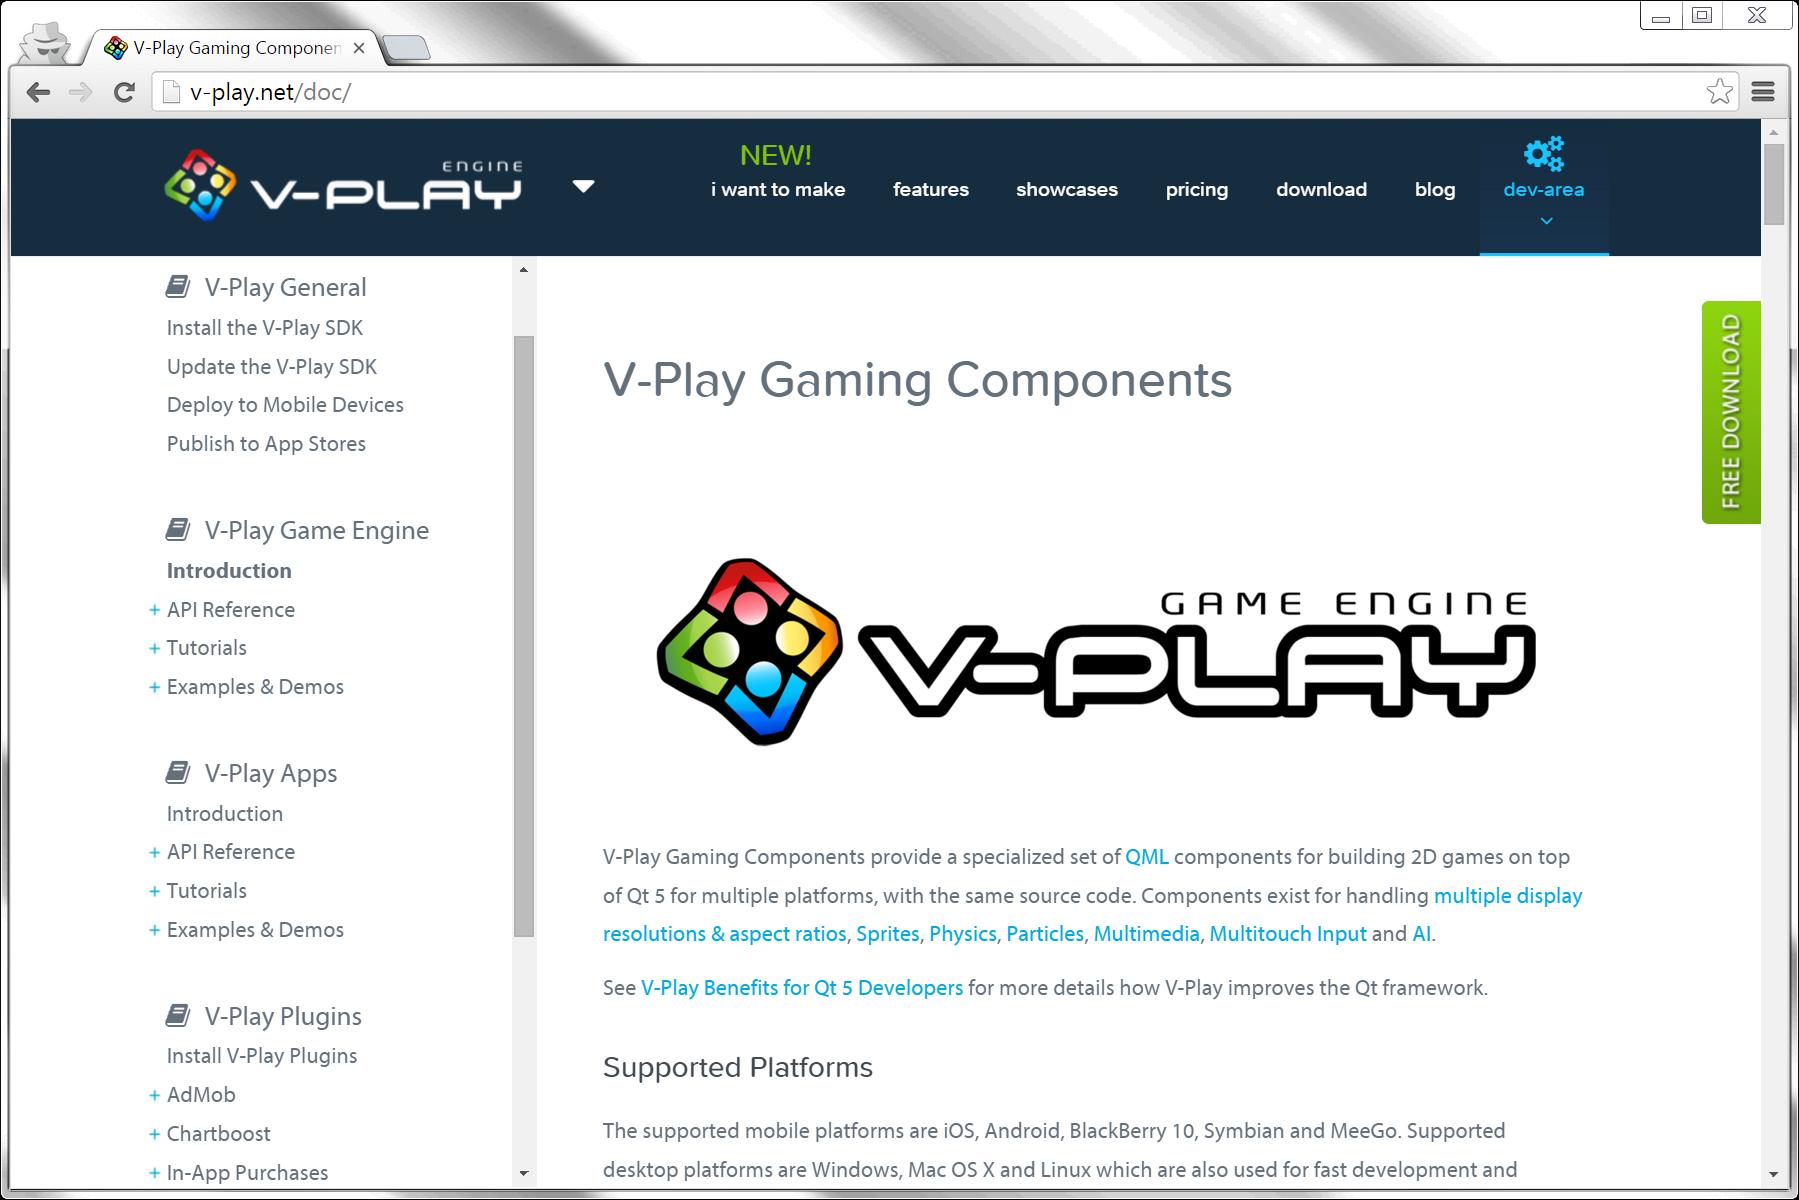 V-Play Documentation Navigation